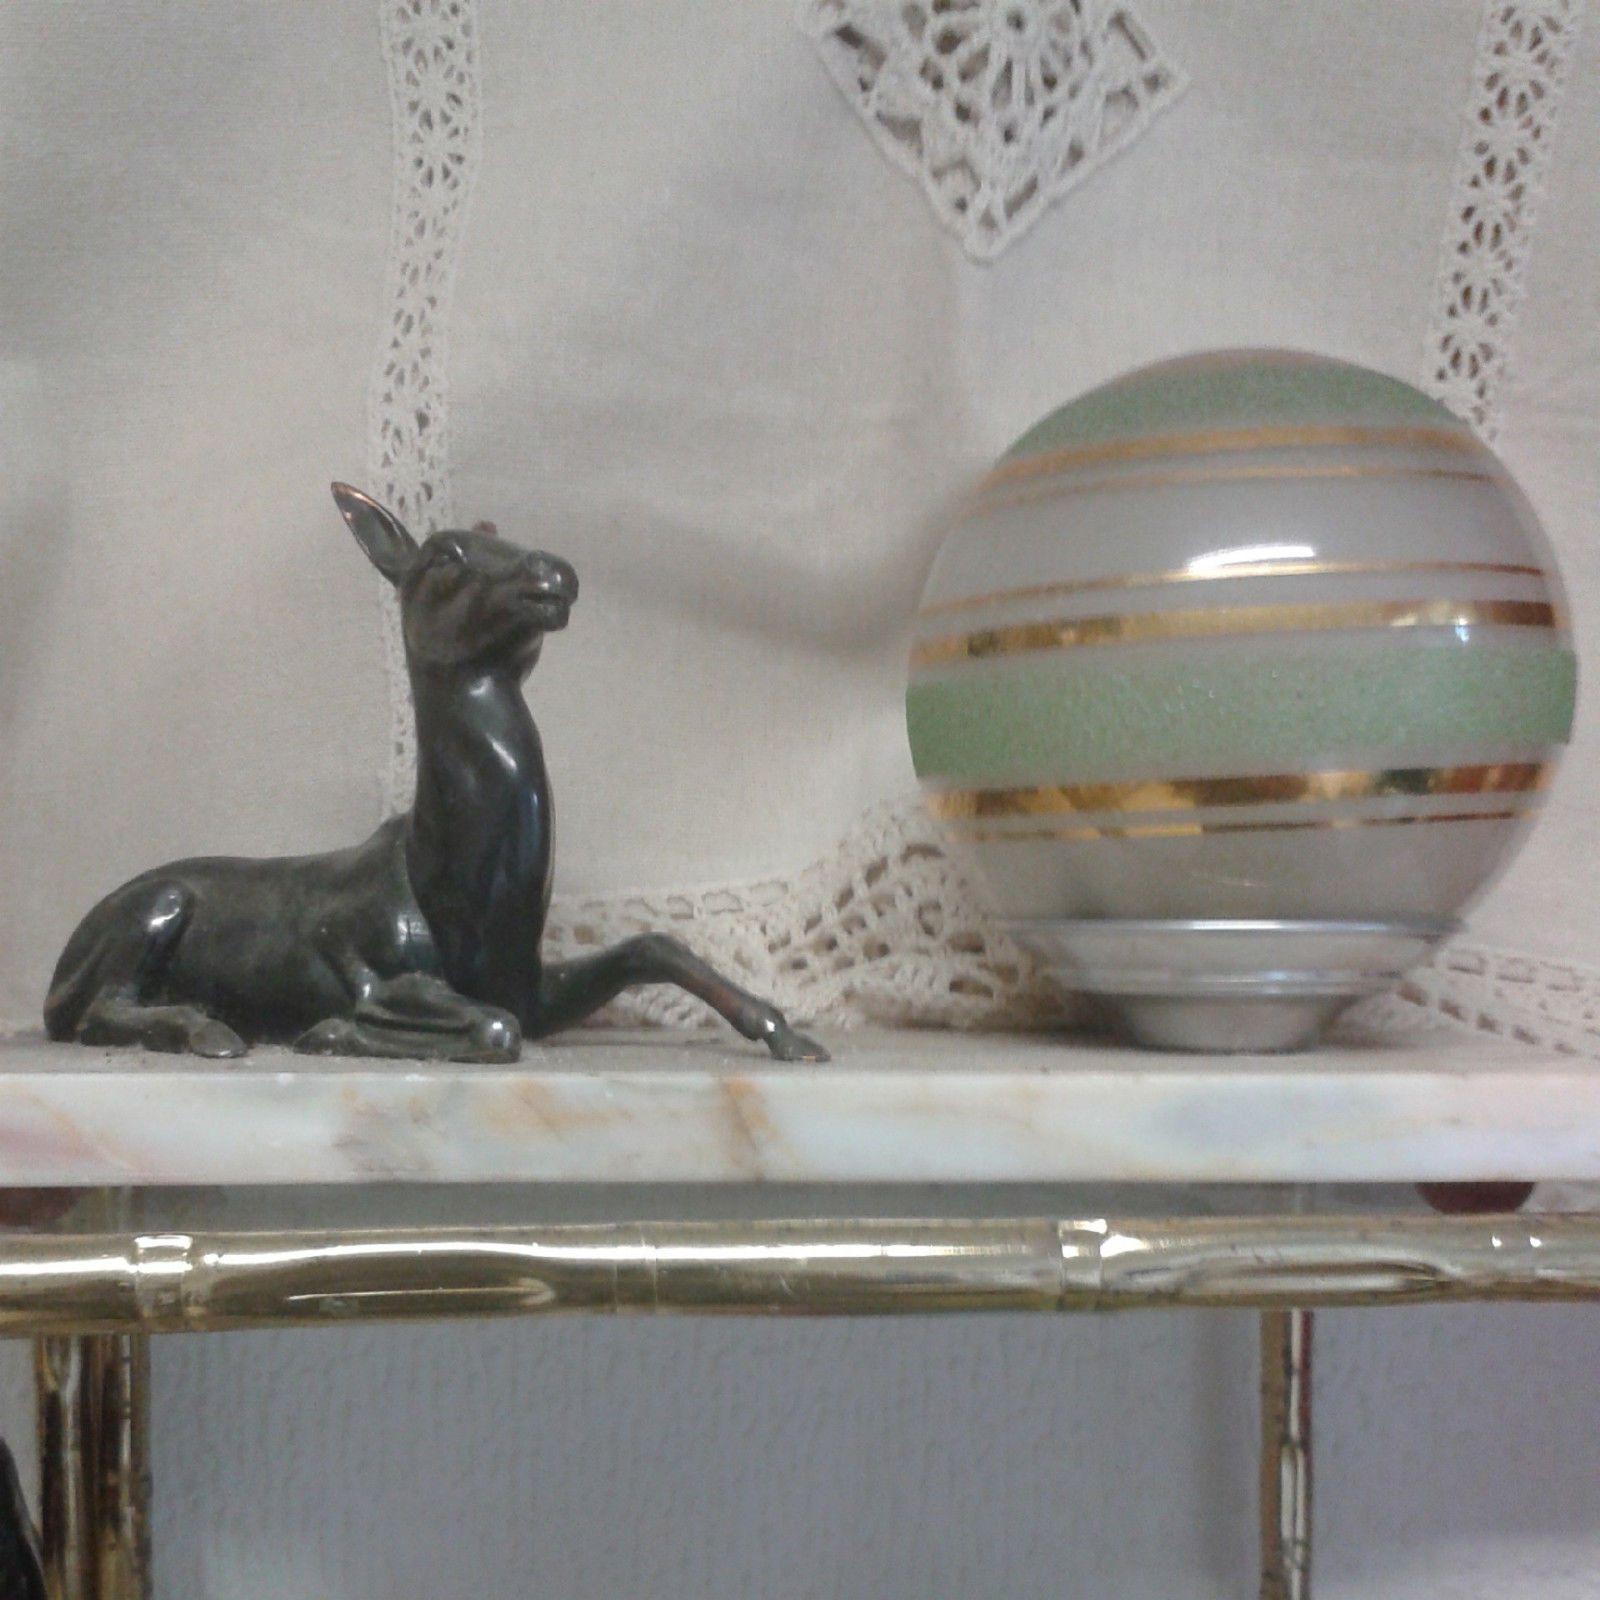 belle lampe de chevet art déco  ebay  lampade da tavolo